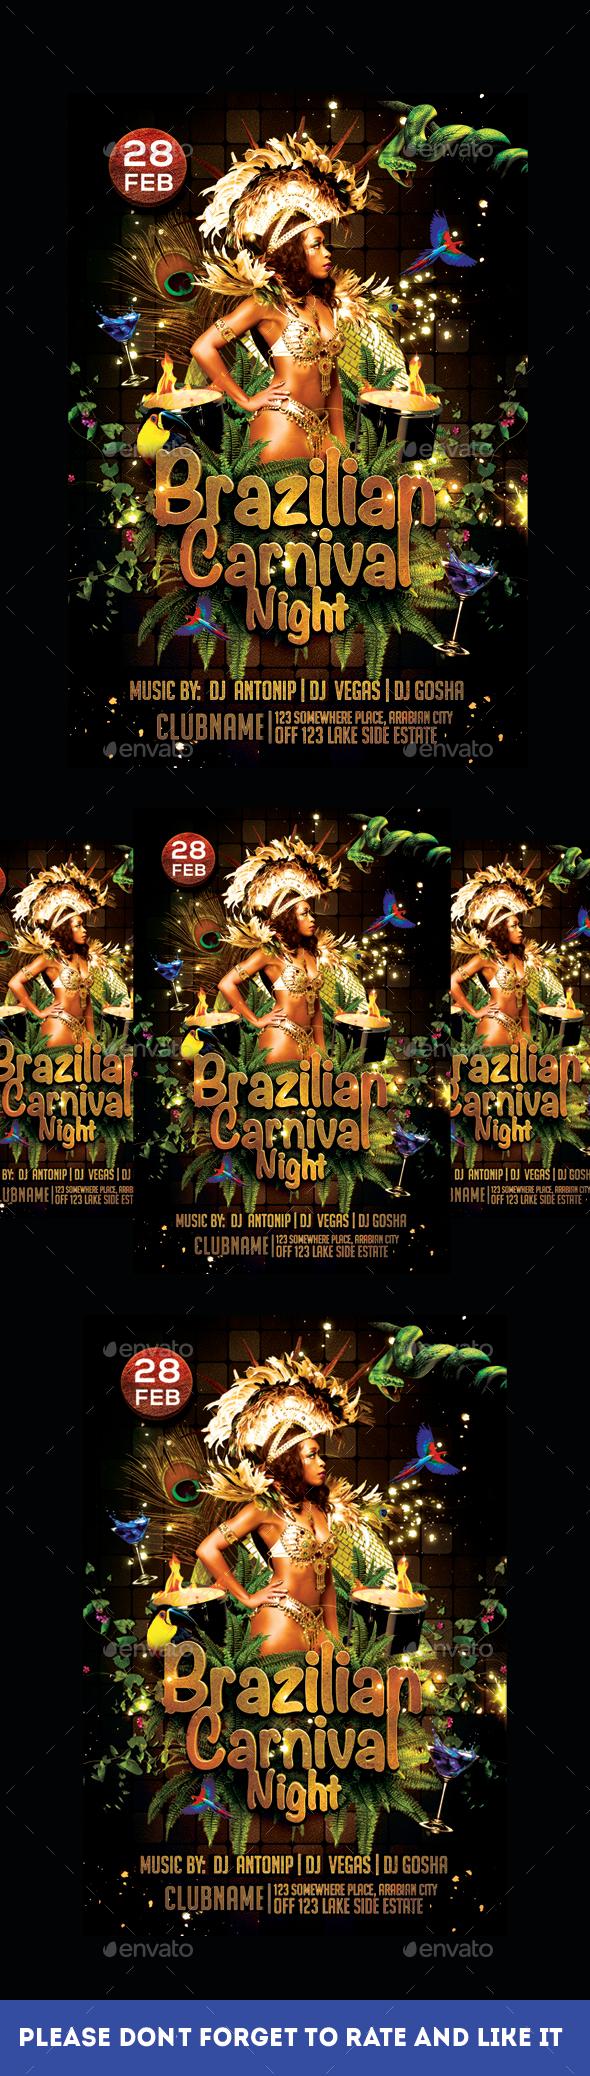 Brazilian Carnival Night Flyer - Flyers Print Templates